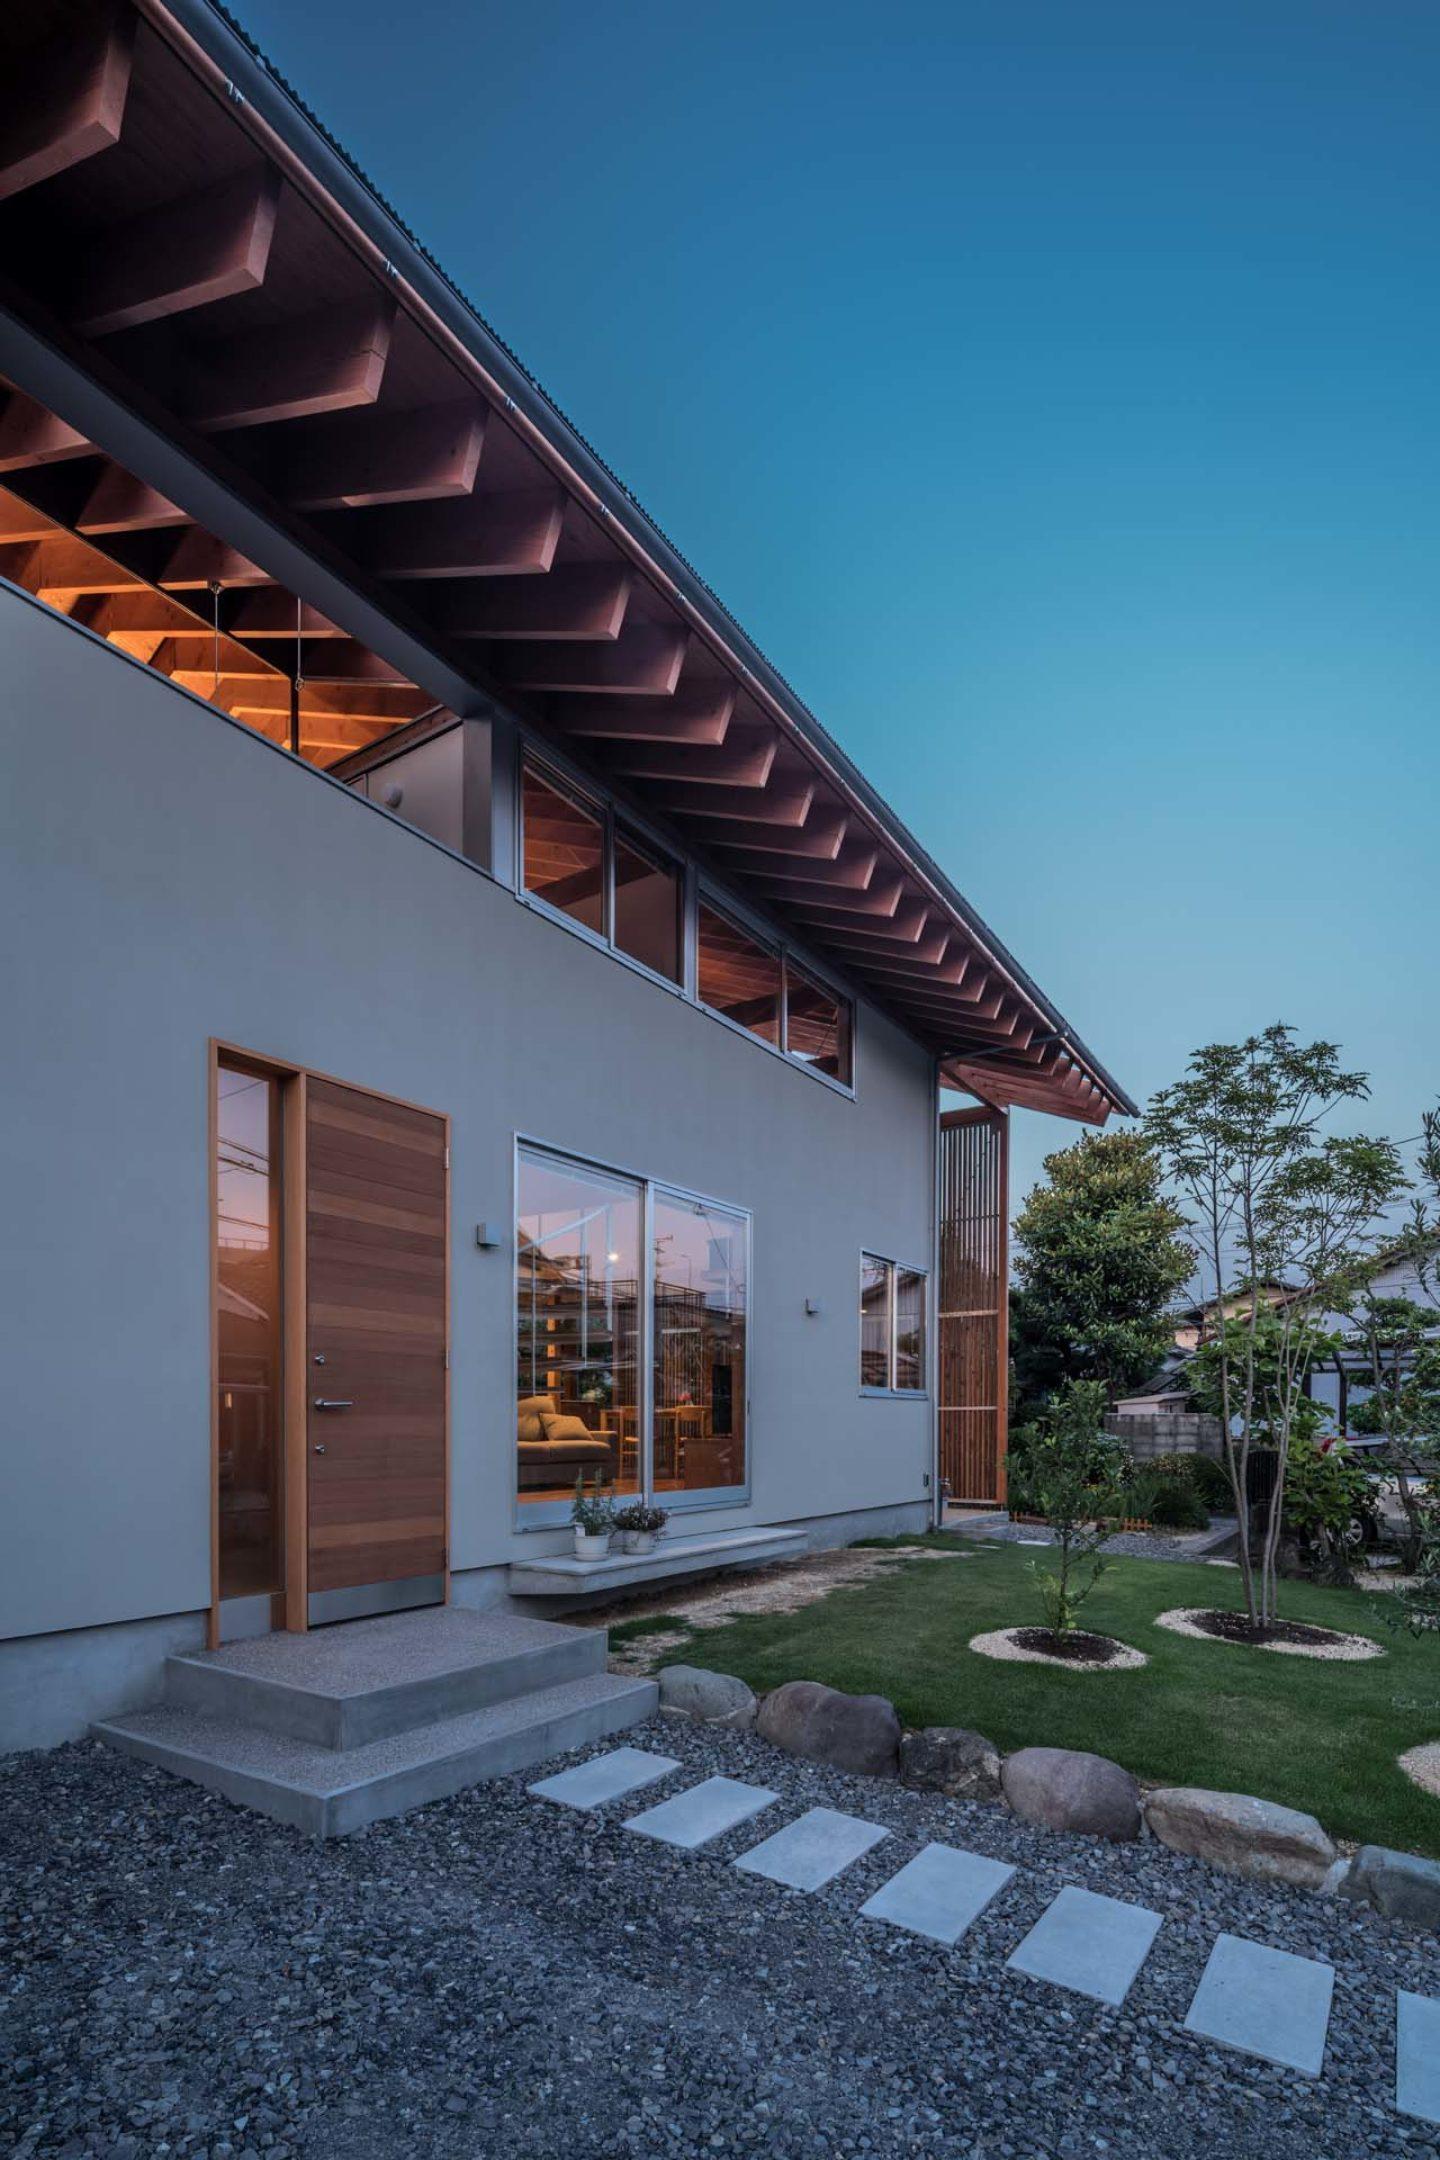 IGNANT-Architecture-Kota-Mizuishi-House-In-Otai-0016